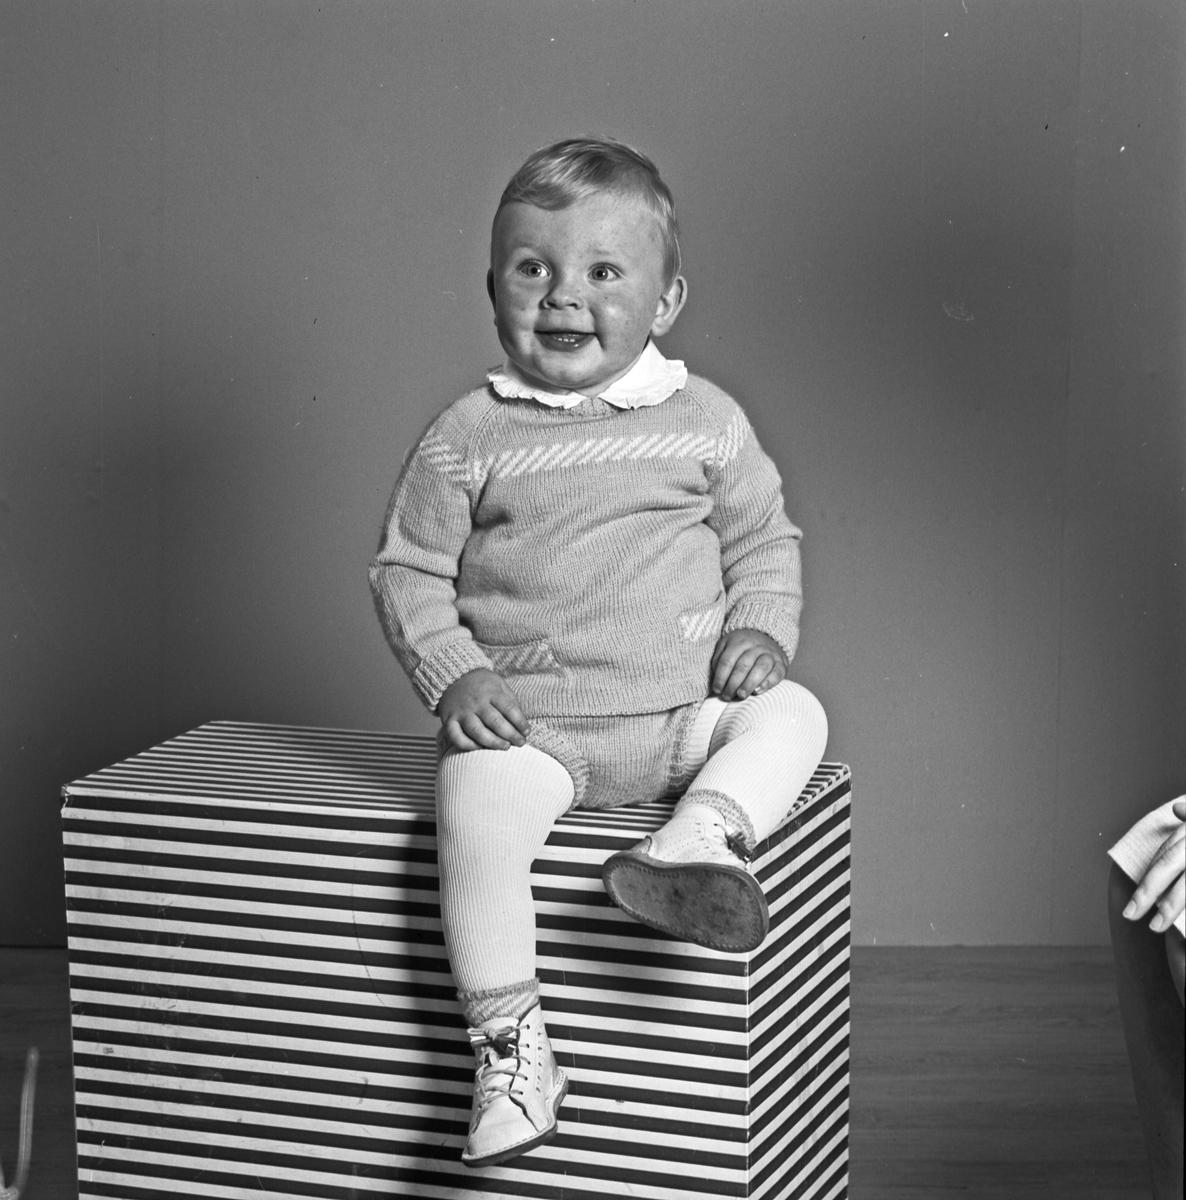 Portrett liten gutt - bestiller Arne Baustad